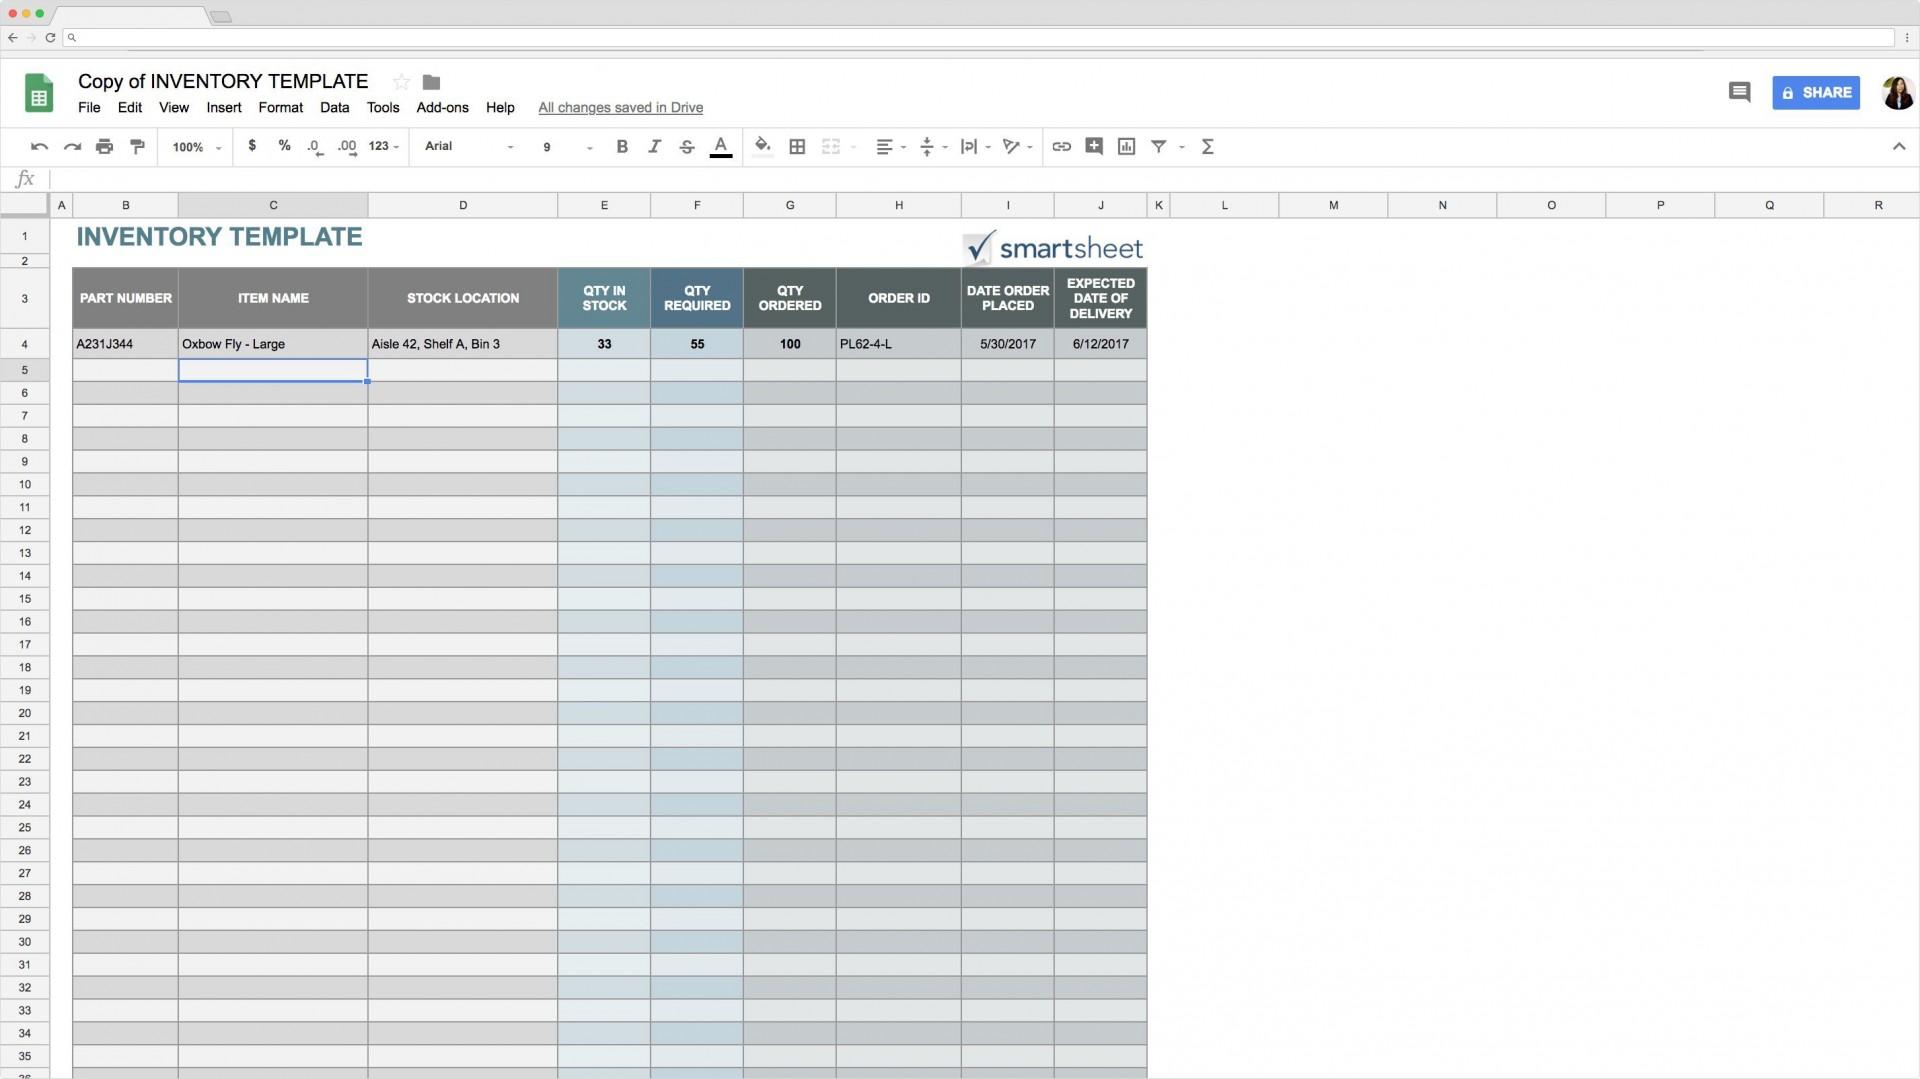 004 Wondrou Small Busines Inventory Spreadsheet Template Design  Pdf1920